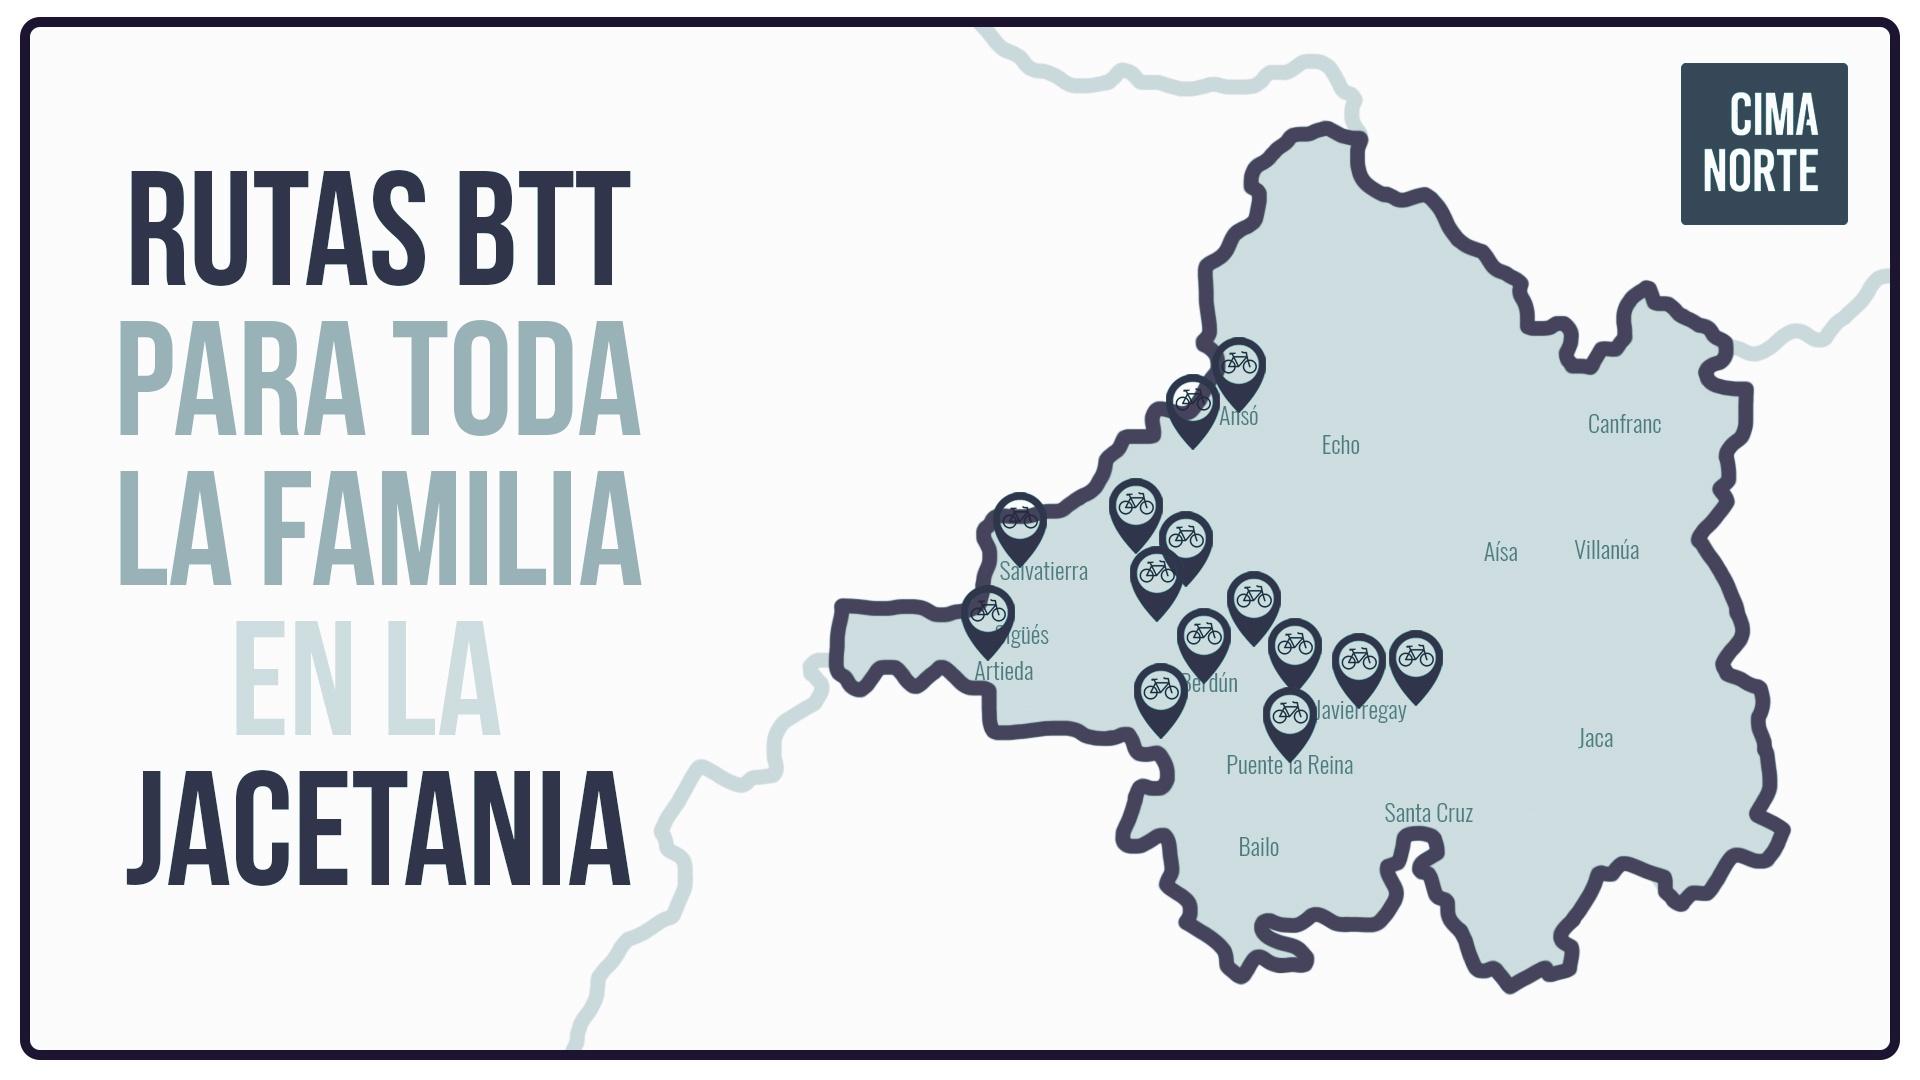 mapa rutas btt jacetania